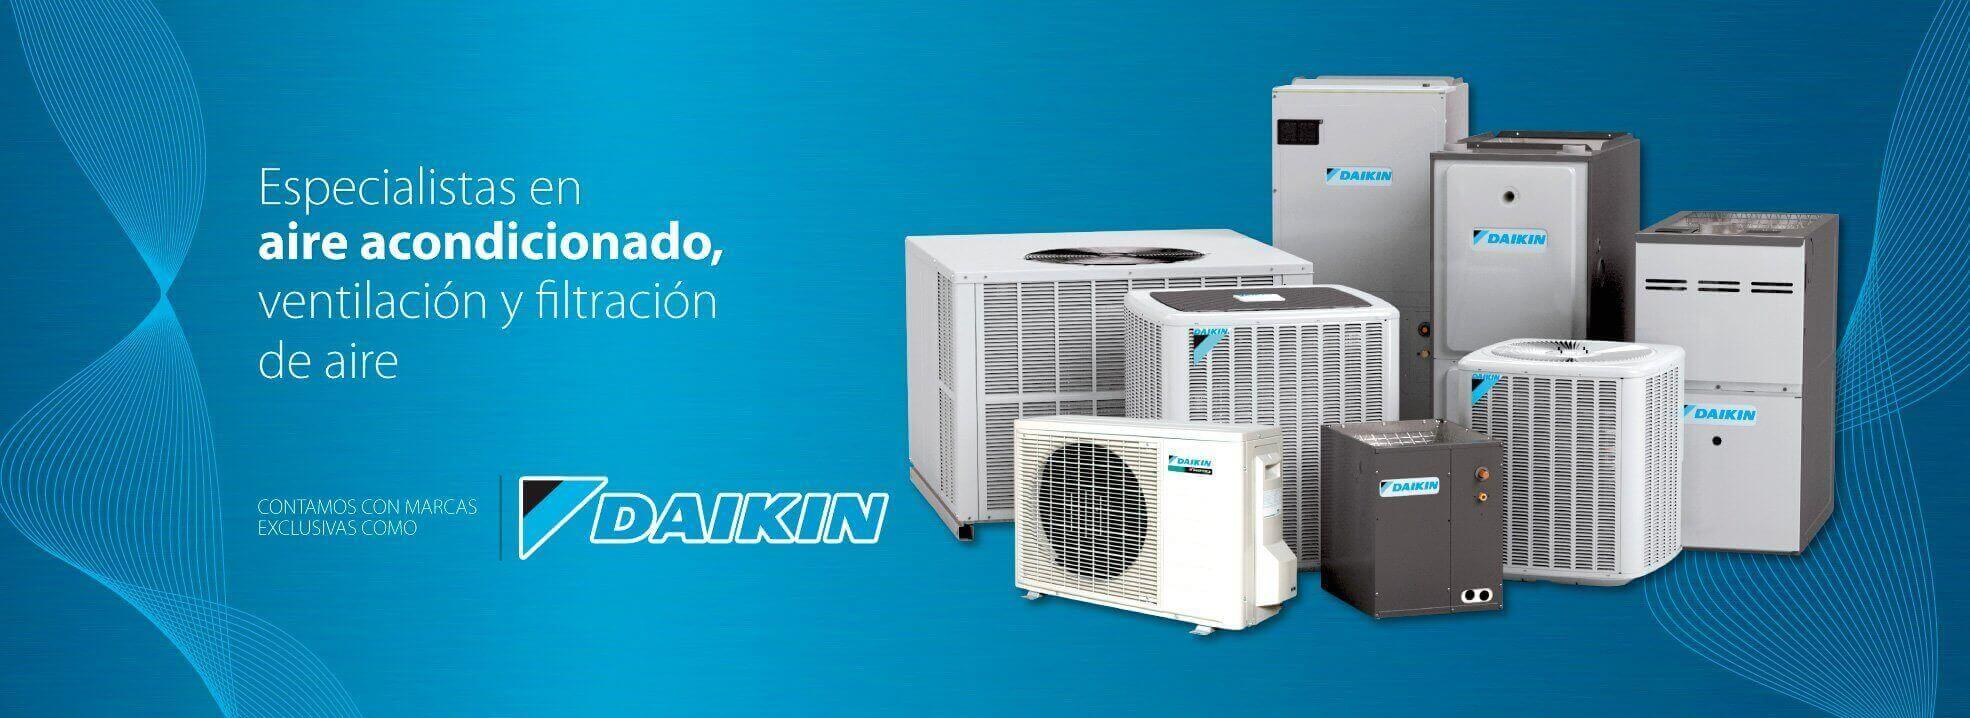 aire-acondicionado-daikin-friotemp Ingenieros Friotemp